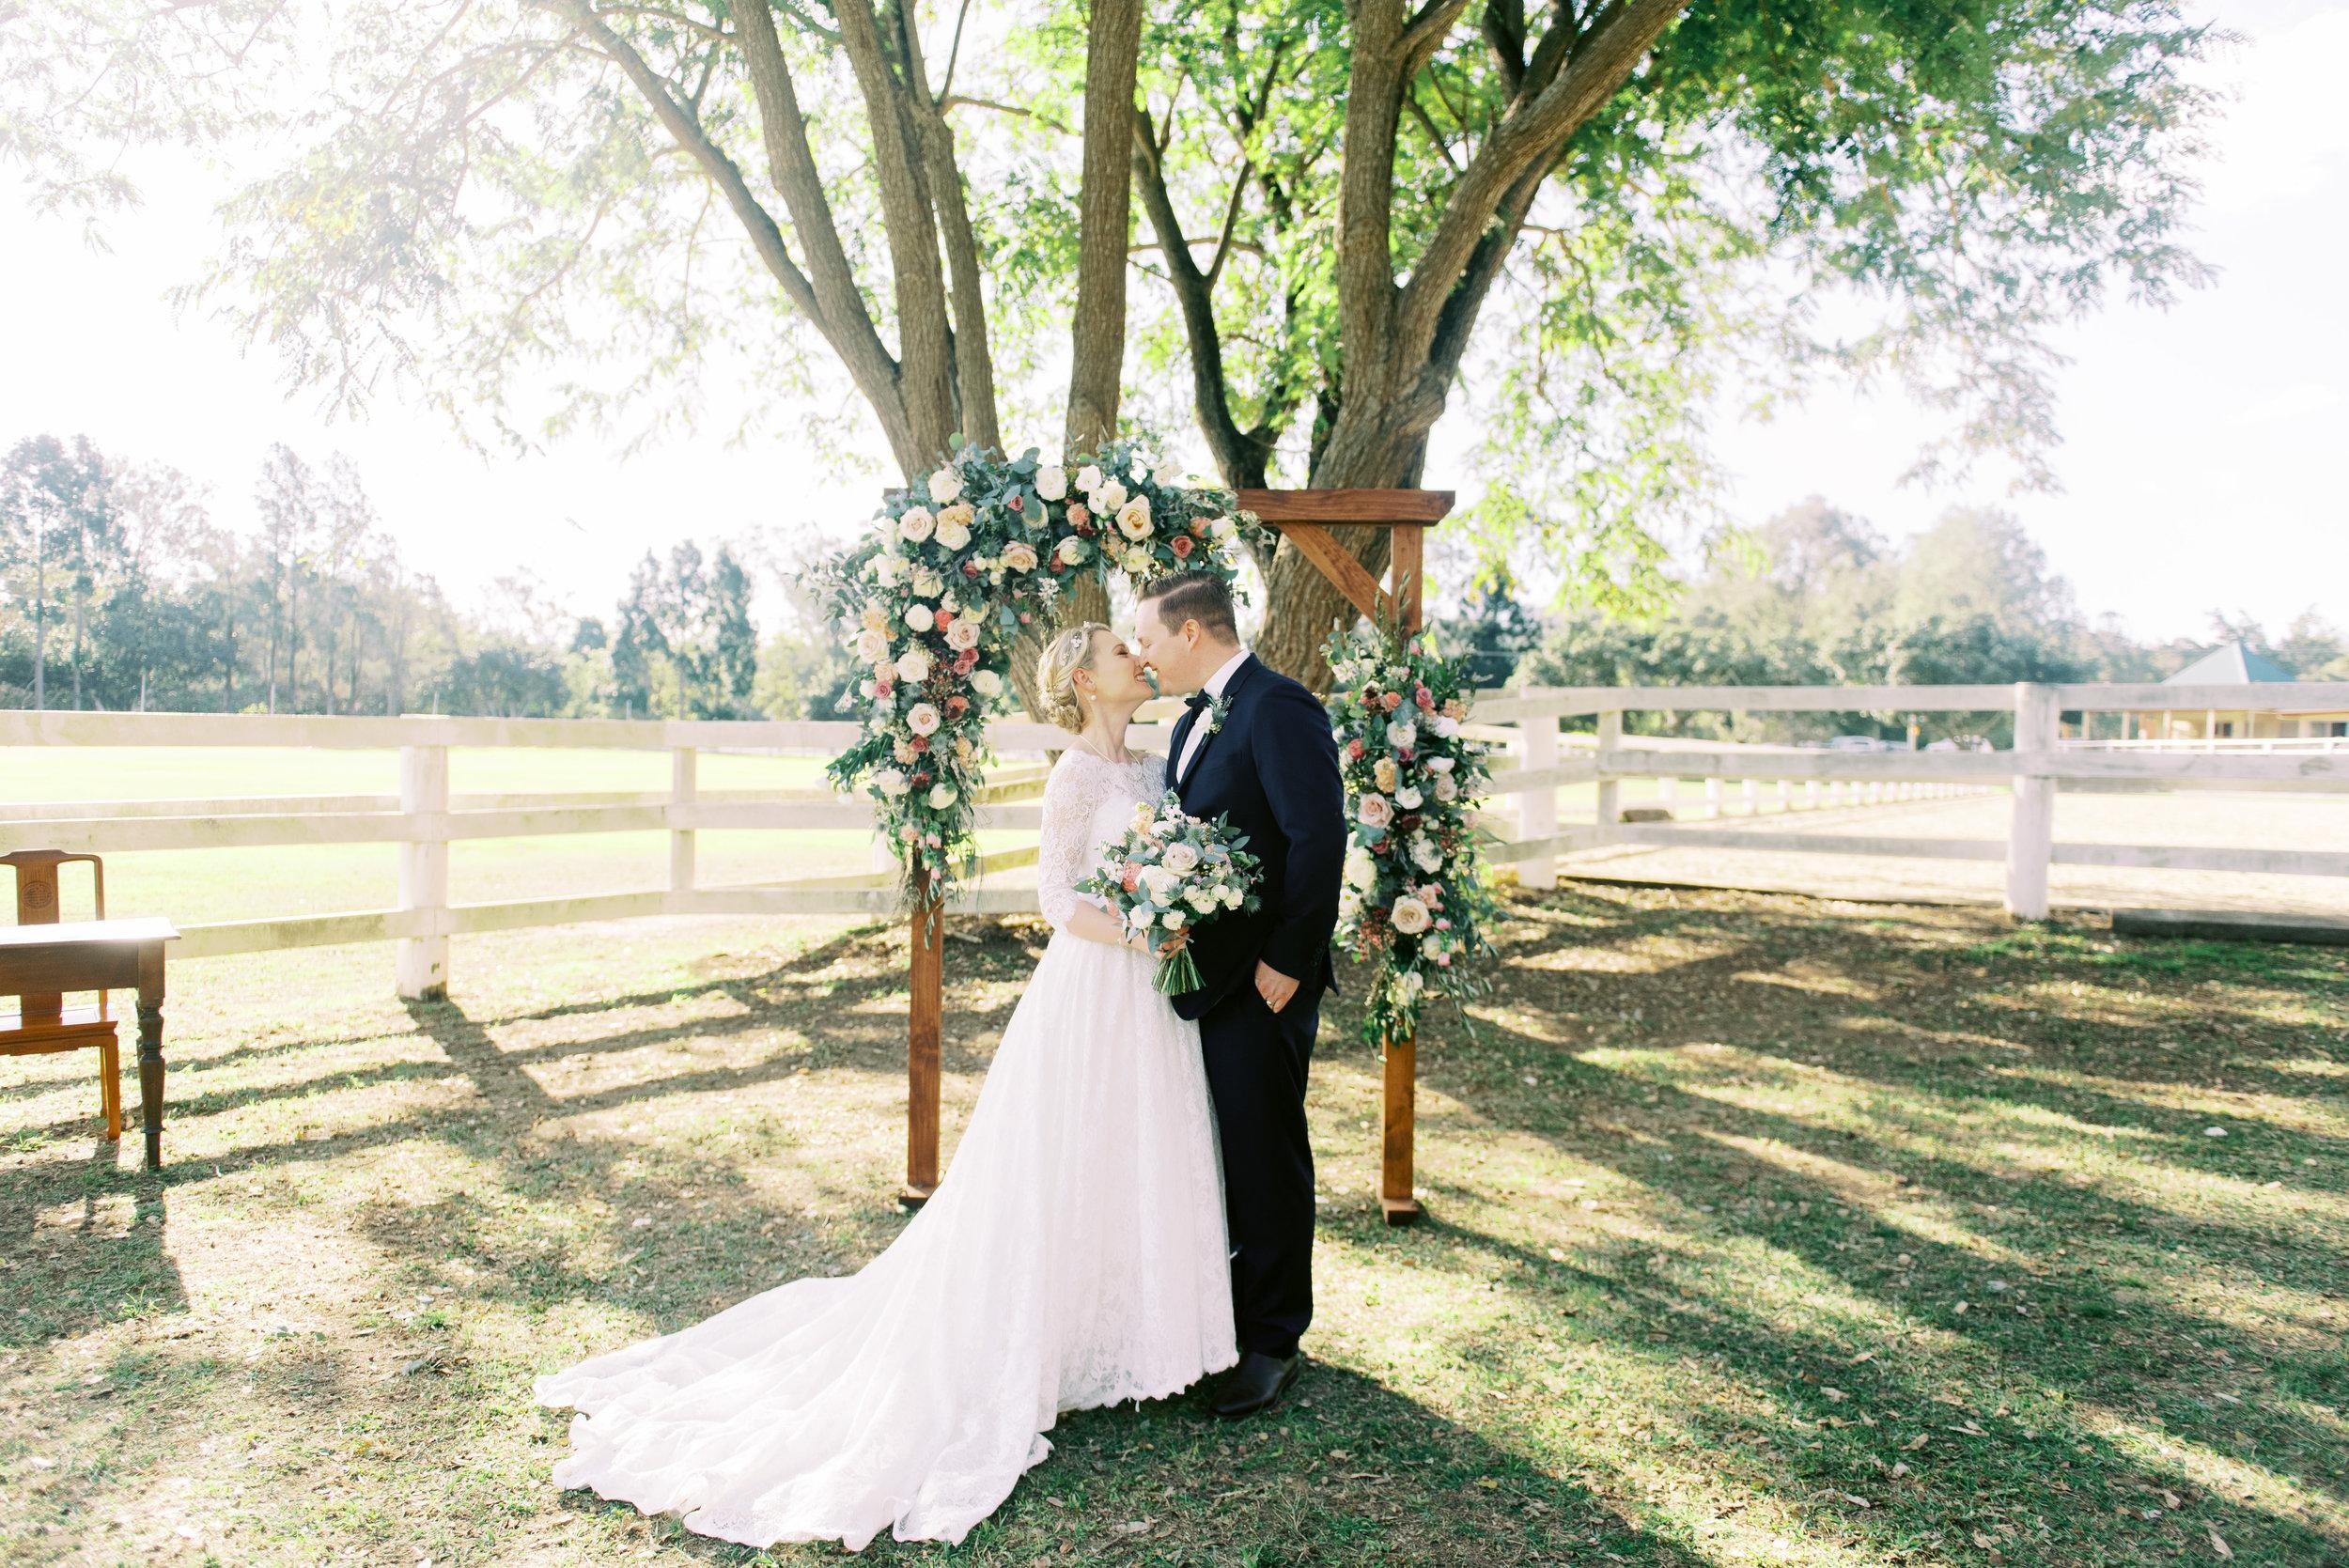 brisbane-gold-coast-sunshine-coast-tweed-romantic-fine-art-wedding-photography-lauren-olivia-34.jpg